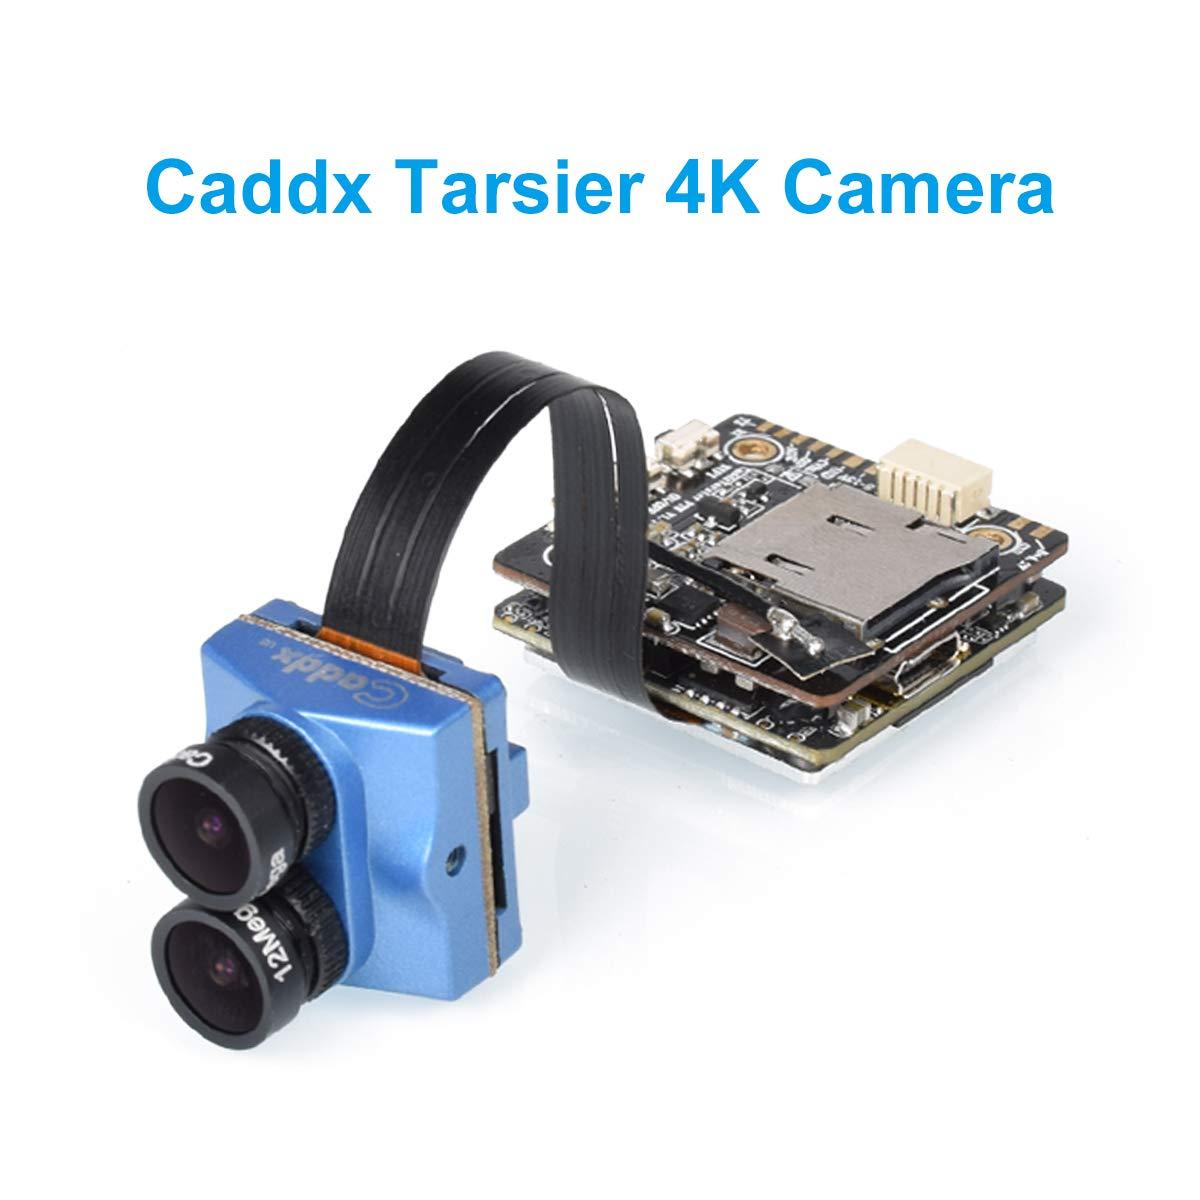 BETAFPV Caddx Tarsier 4K Dual Lens Super WDR Anti-Shake Mini HD FPV Camera DVR Dual Audio OSD for Beta85X 4K RC Racing Drone Quadcopter by BETAFPV